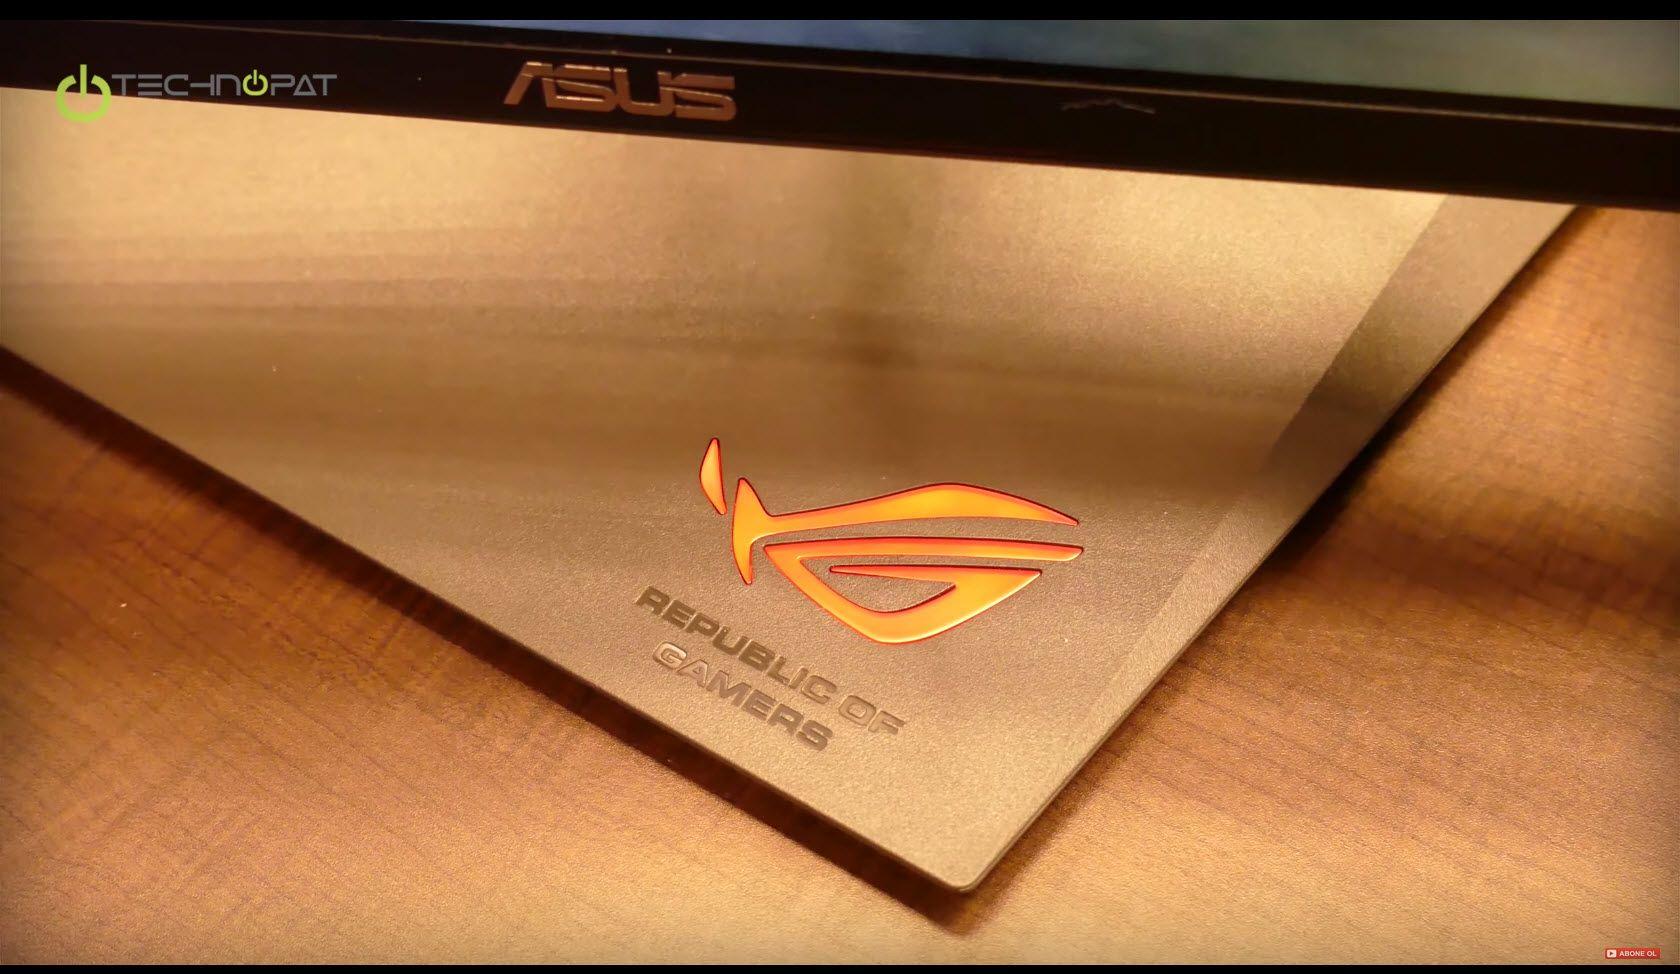 ASUS ROG Swift PG279Q Oyuncu Monitörü - Computex 2015